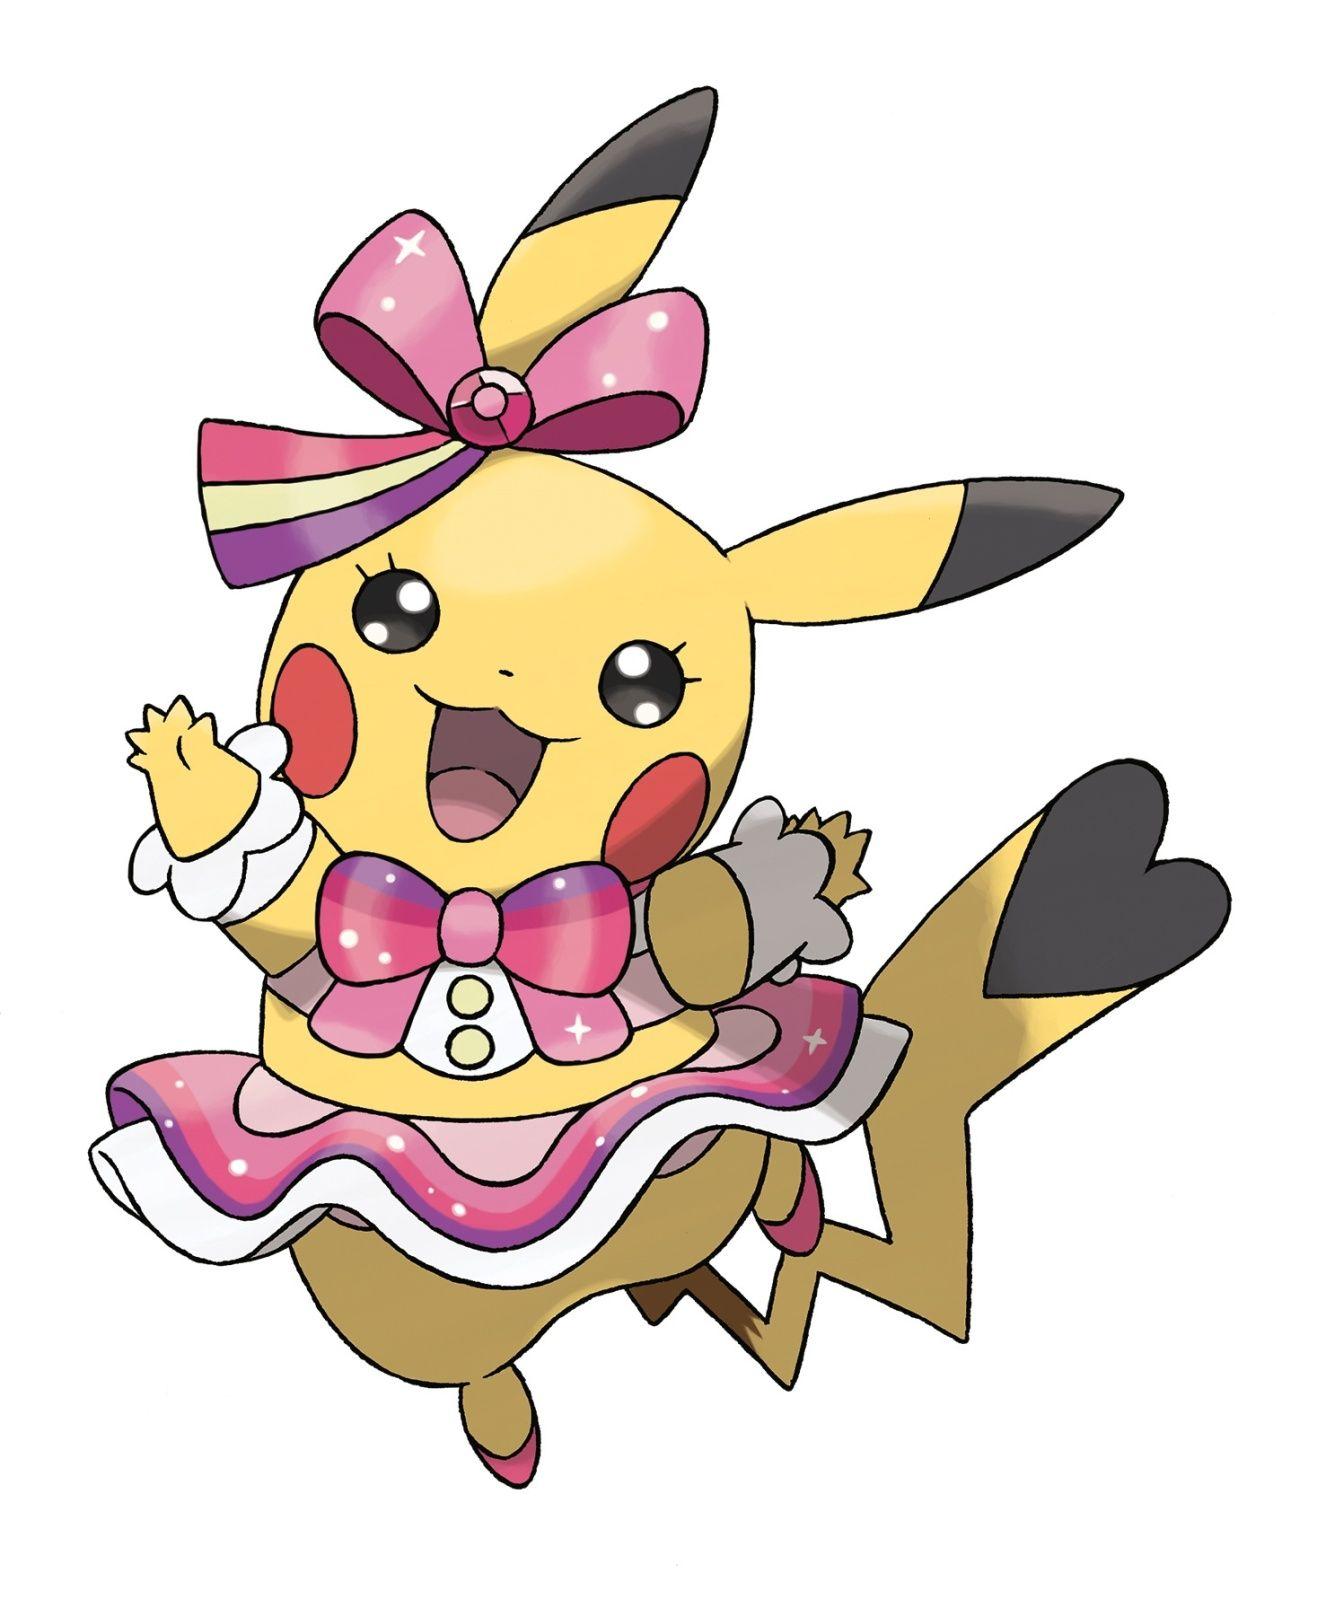 pikachu wearing pokemon costumes - google search | pokemon